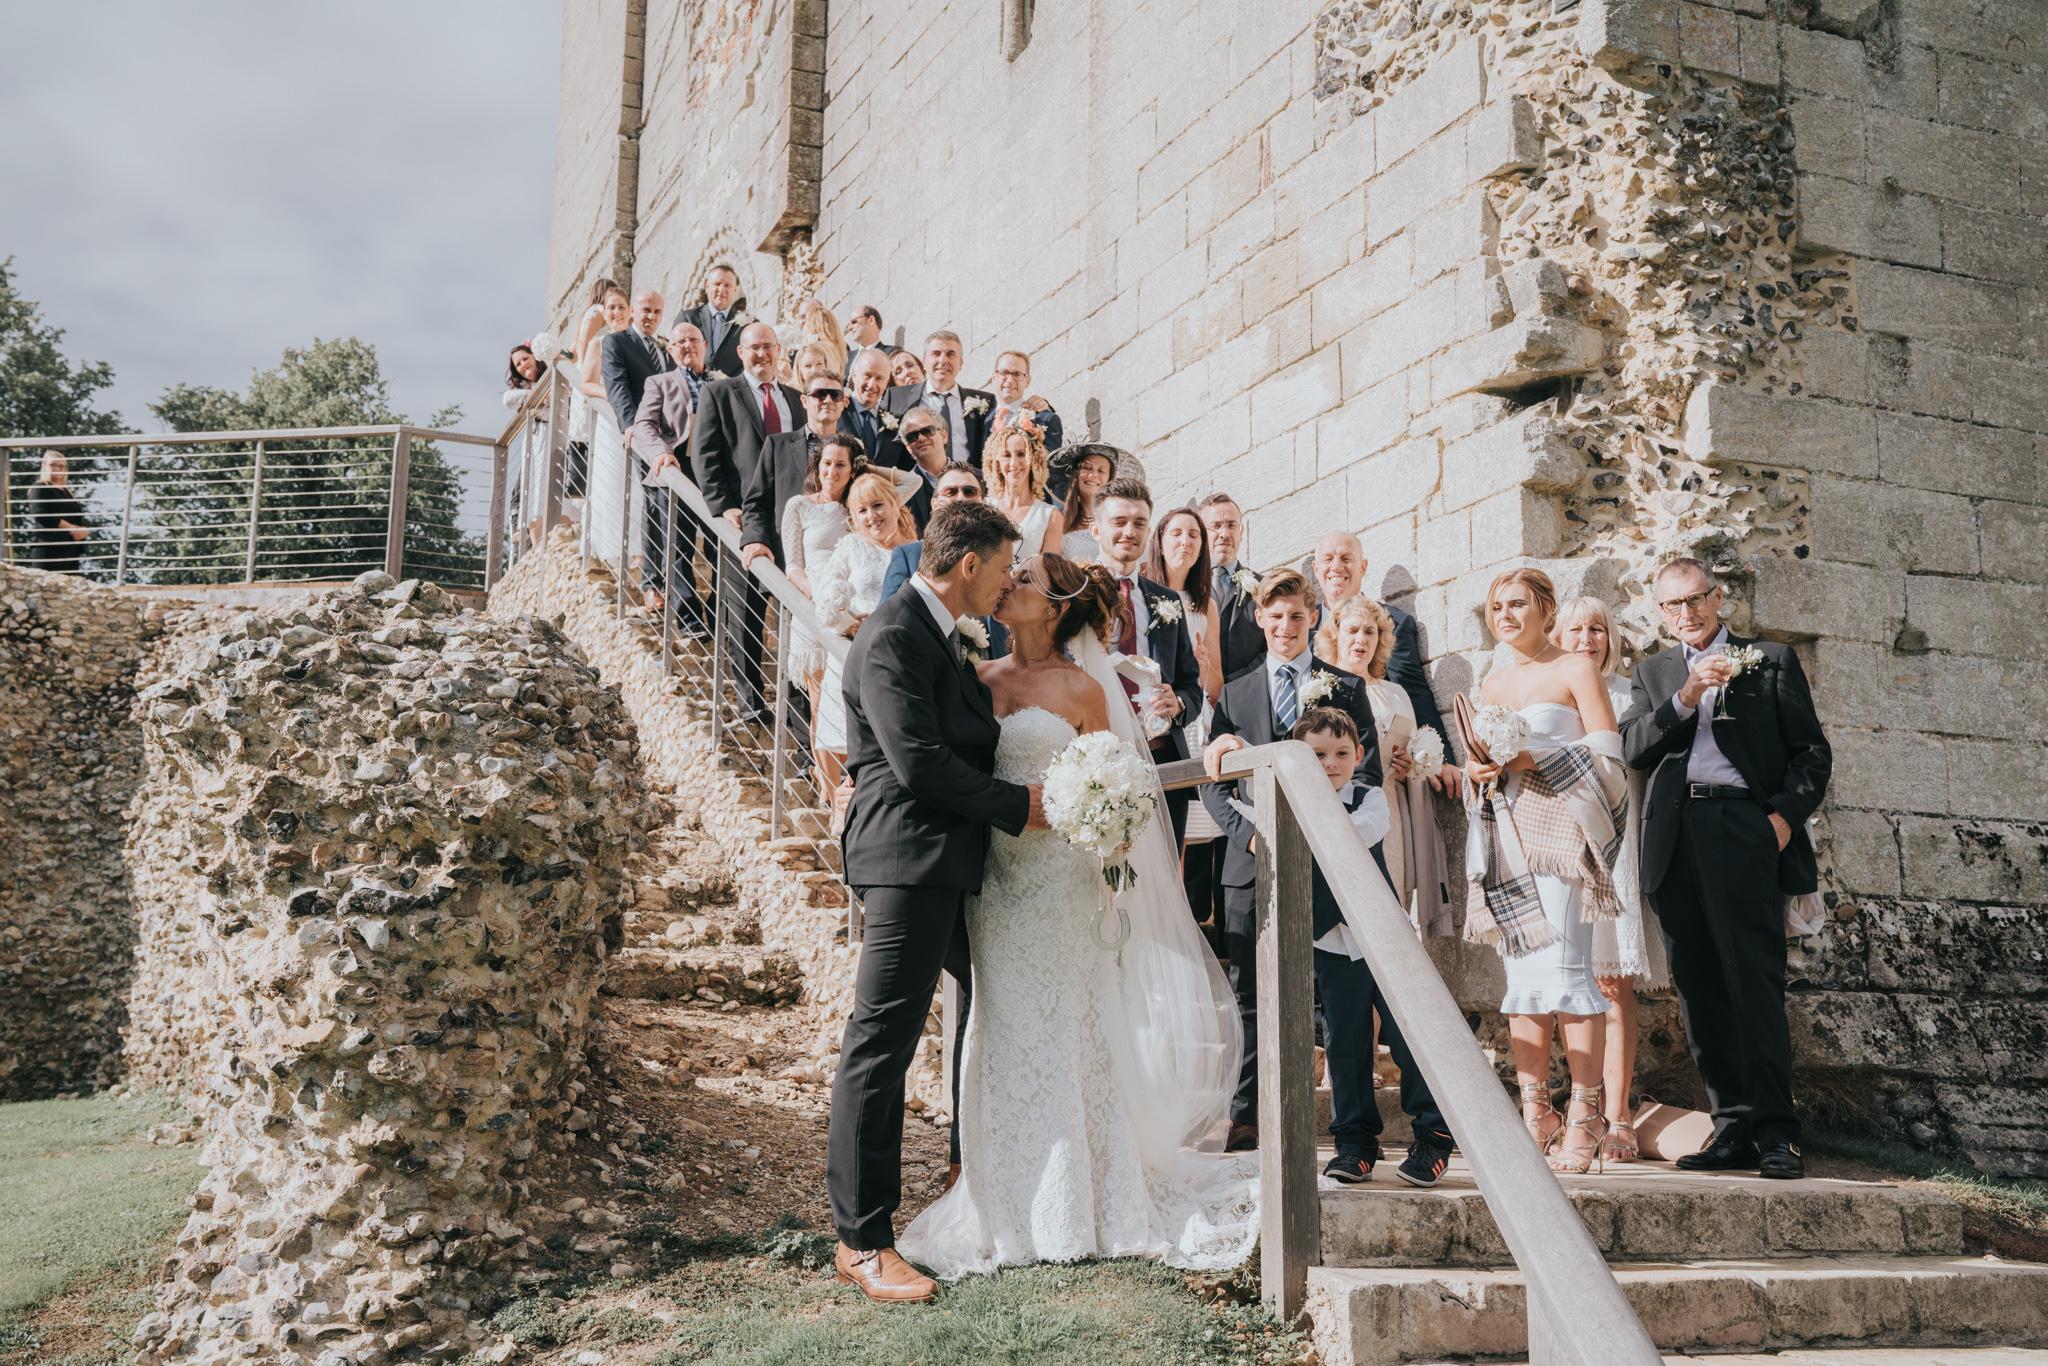 grace-elizabeth-boho-wedding-headingham-castle-essex-wedding-photographer-62.jpg